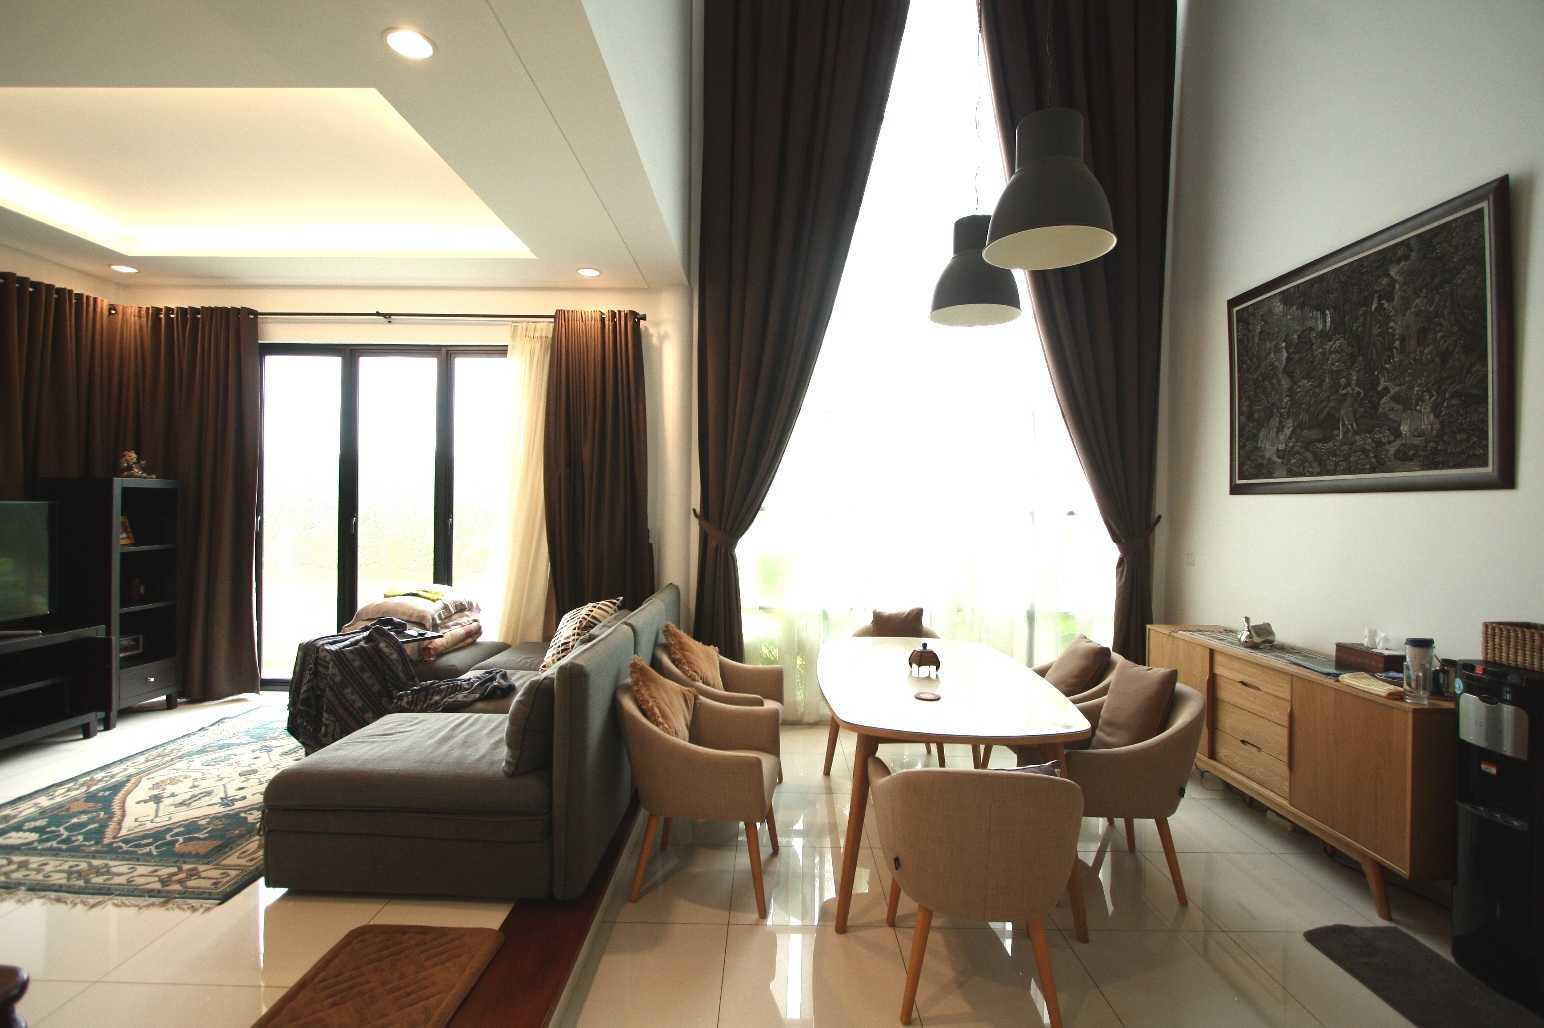 Ddap Architect Foresta Fiore House Bsd Tangerang Bsd Tangerang Img0906 Skandinavia  29567